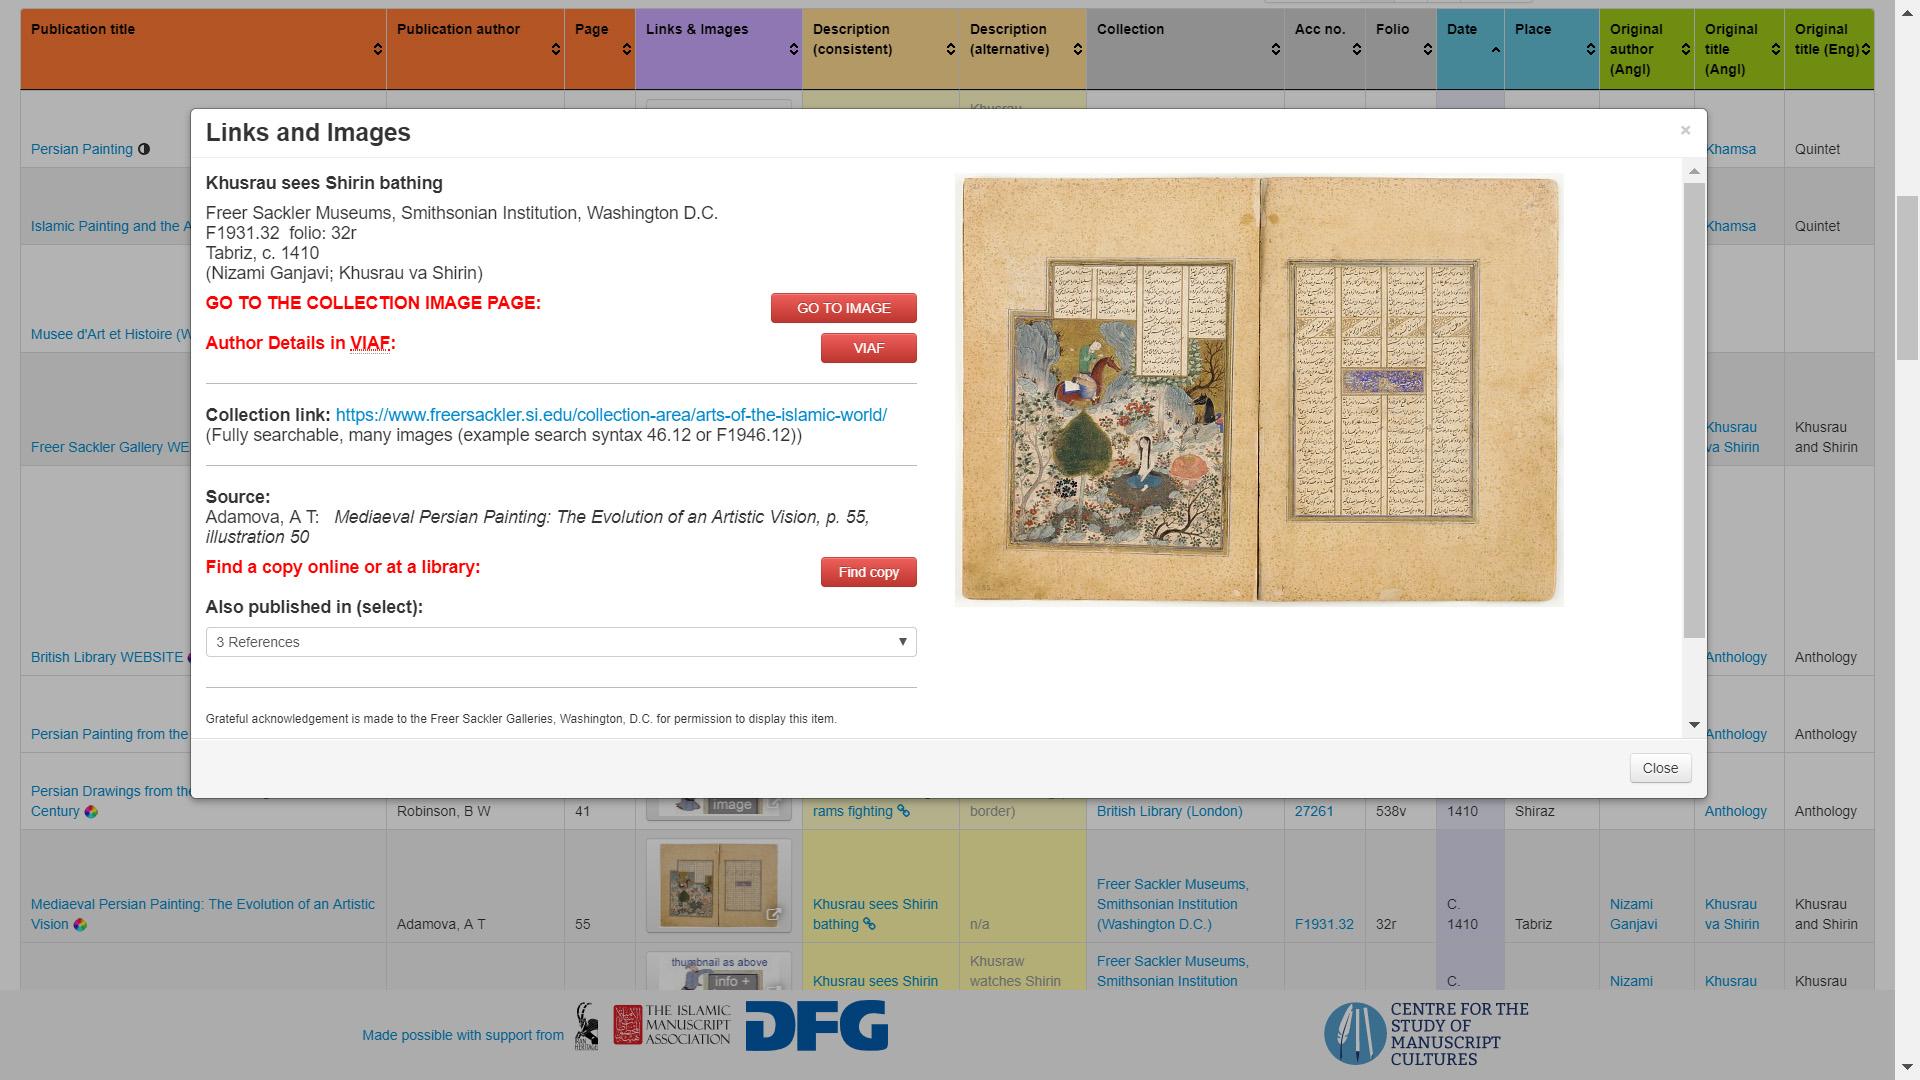 Asian and African studies blog: Digitisation